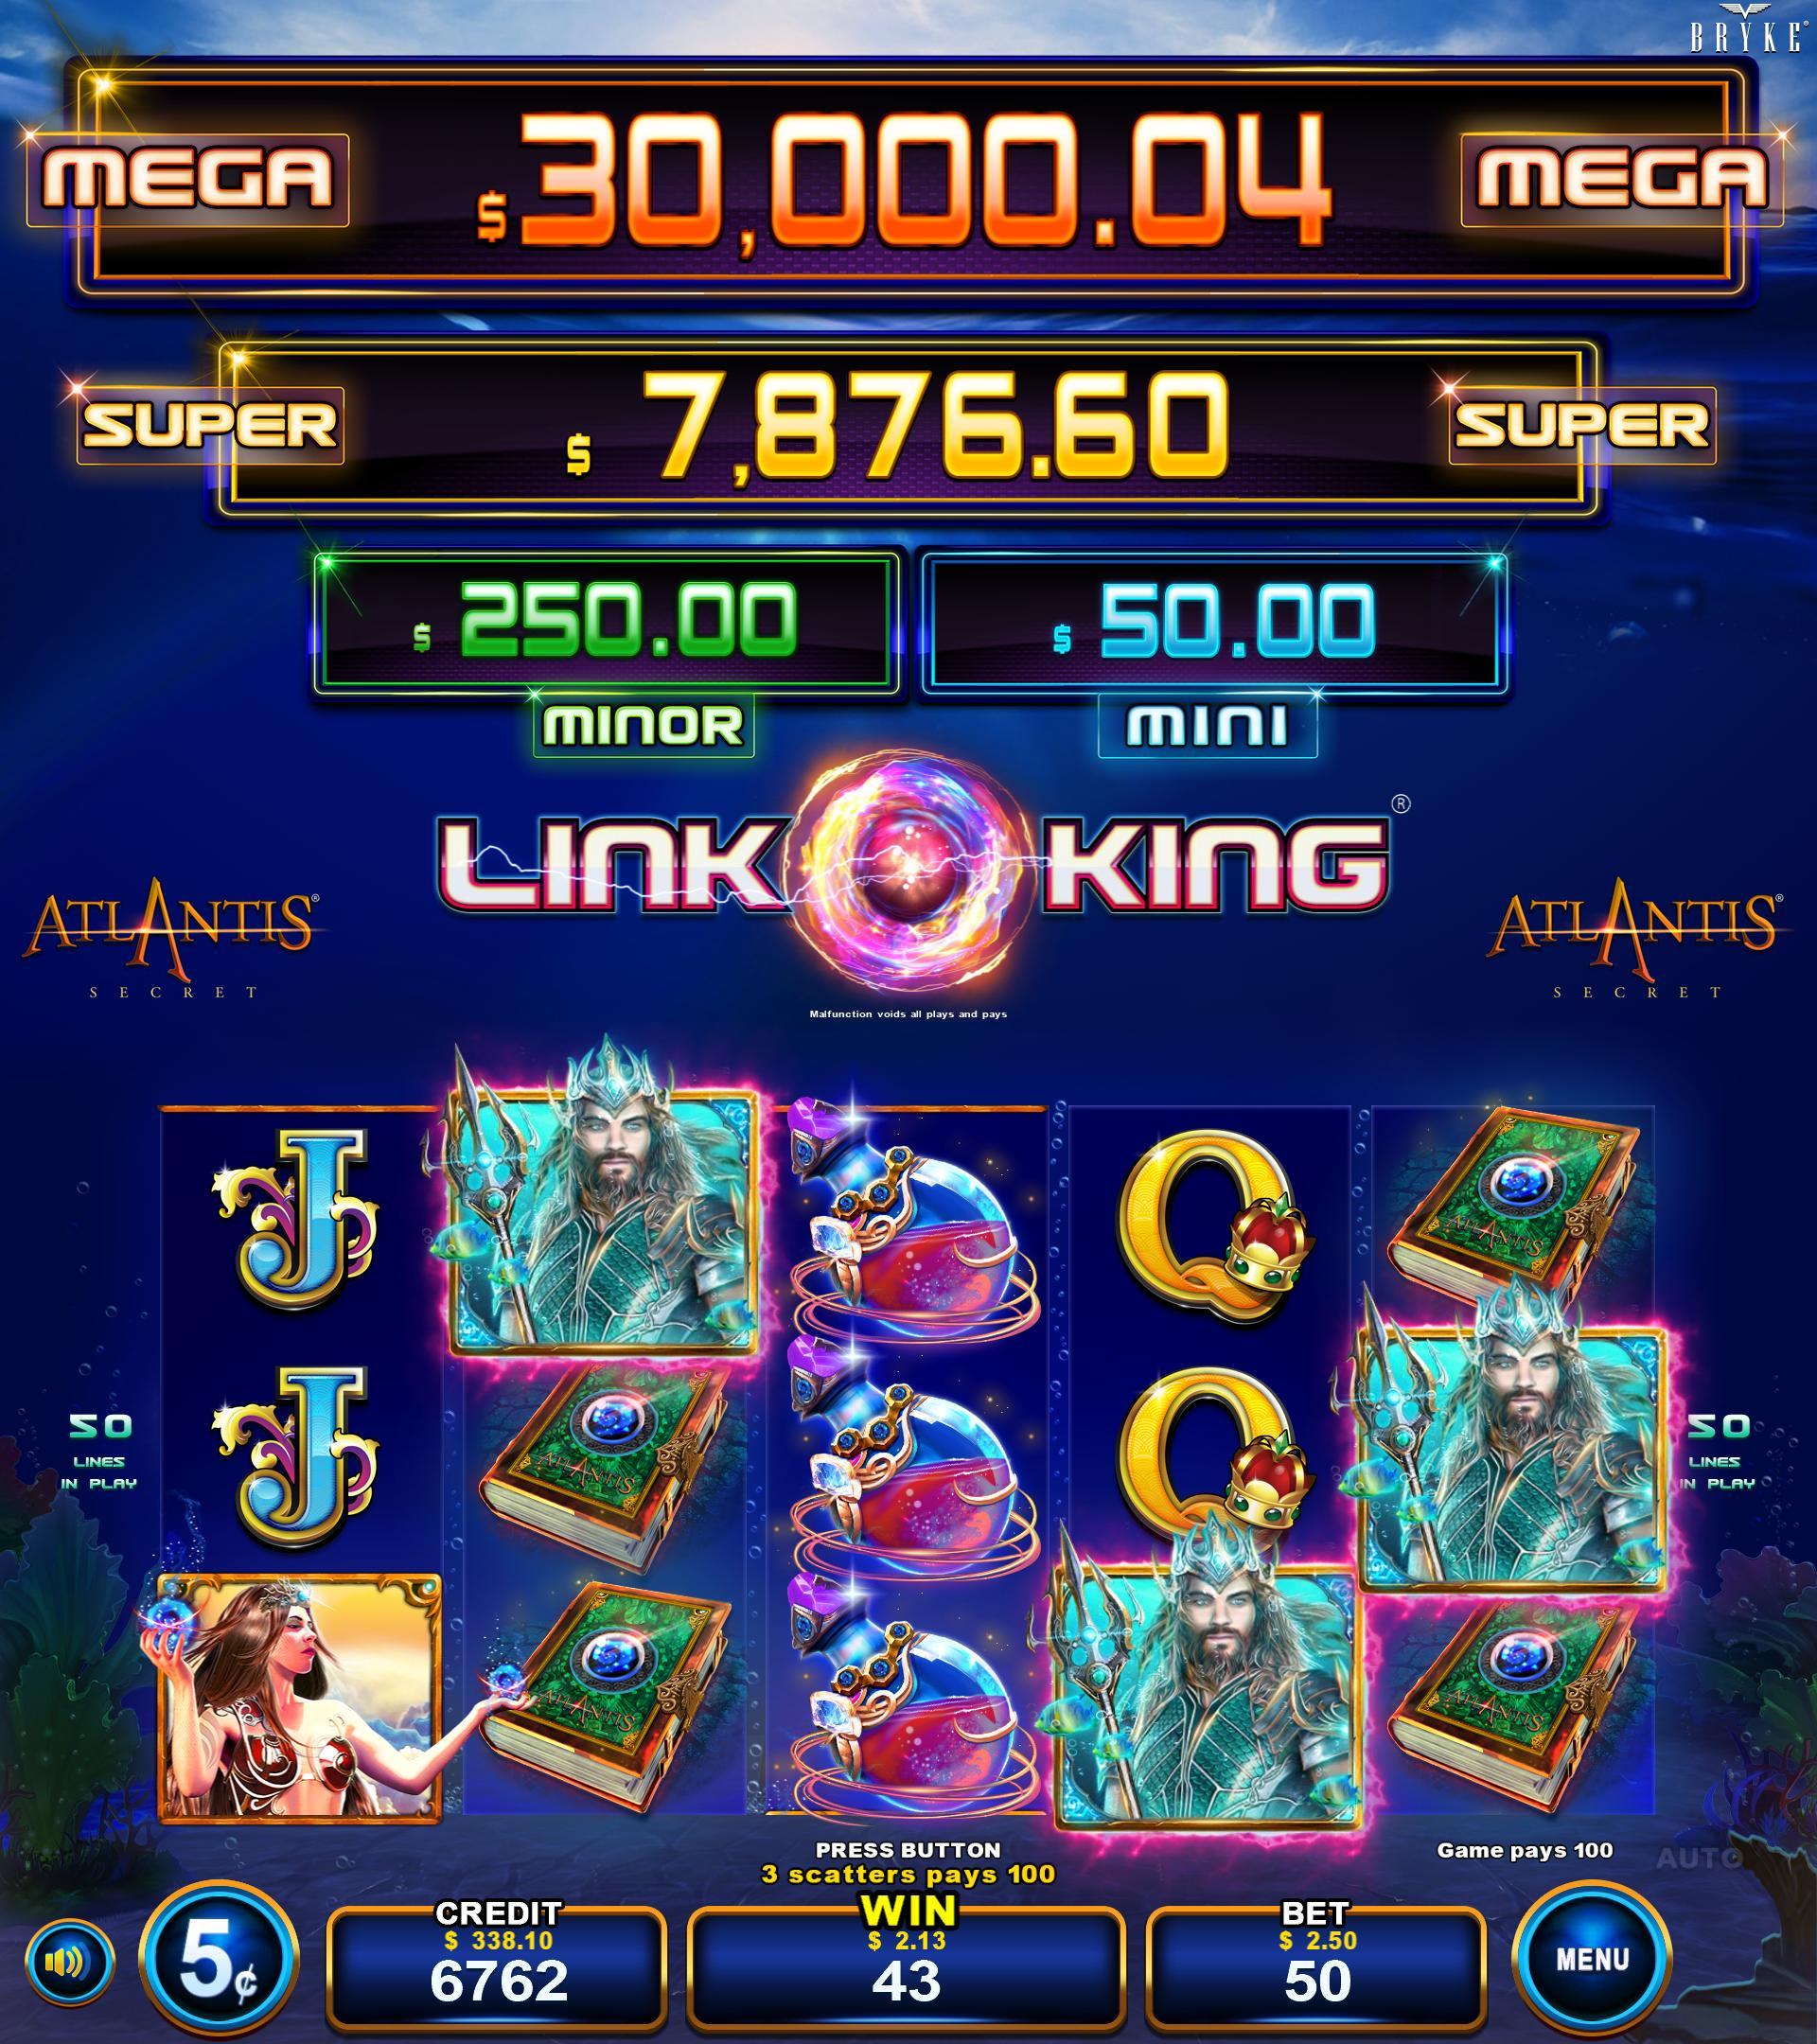 Atlantis Secret screenshot - Zitro Games